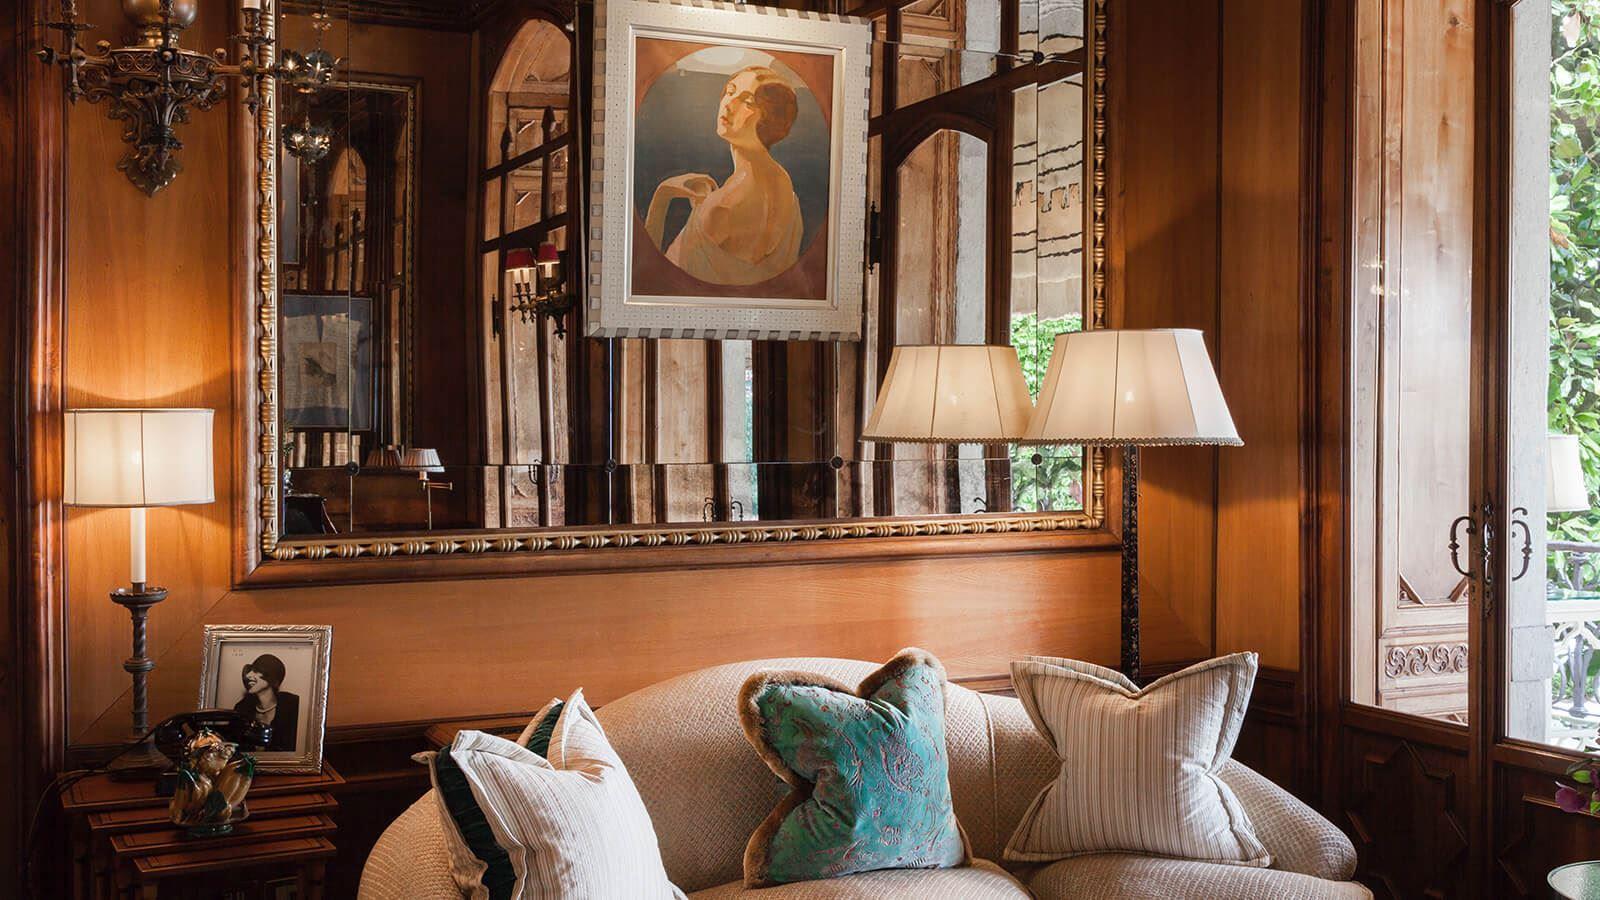 Grand Hotel a Villa Feltrinelli - the stupendous craftsmanship